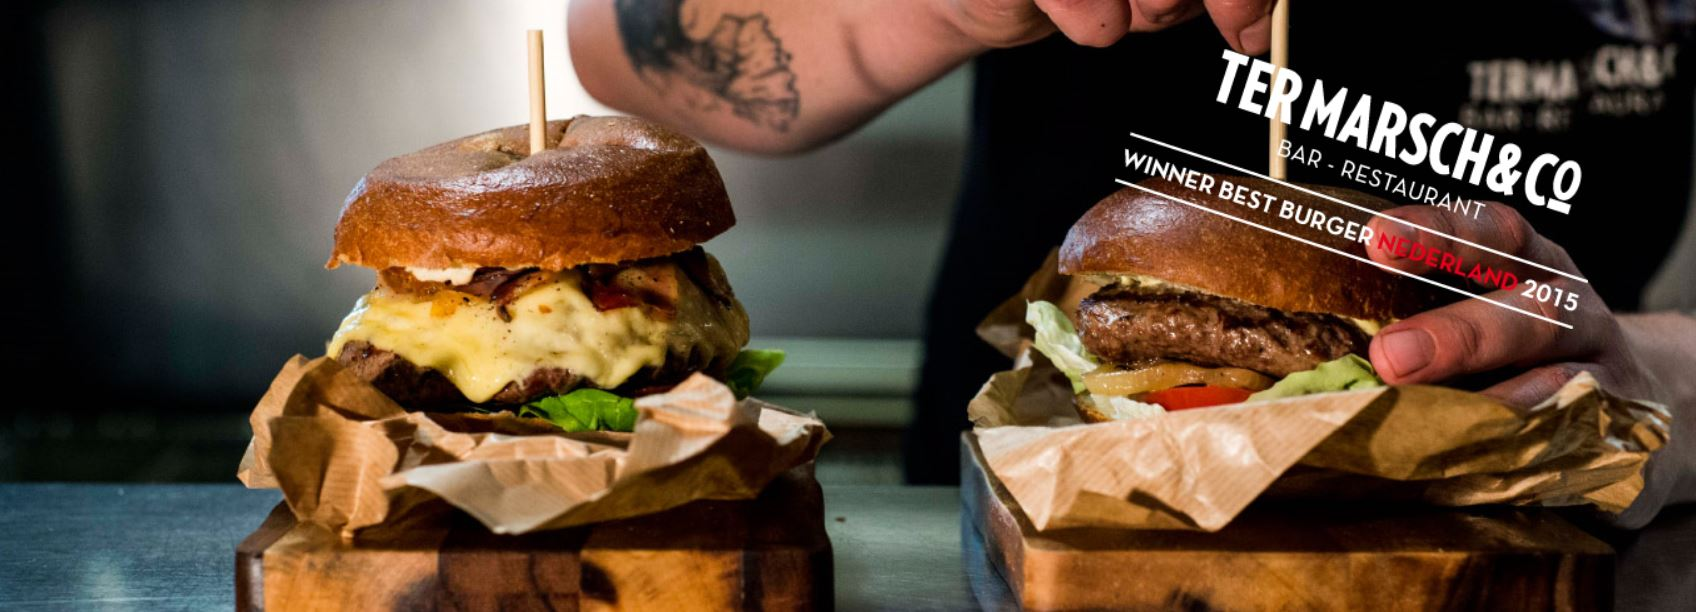 www.termarschenco.nl burgertrutjes hamburger